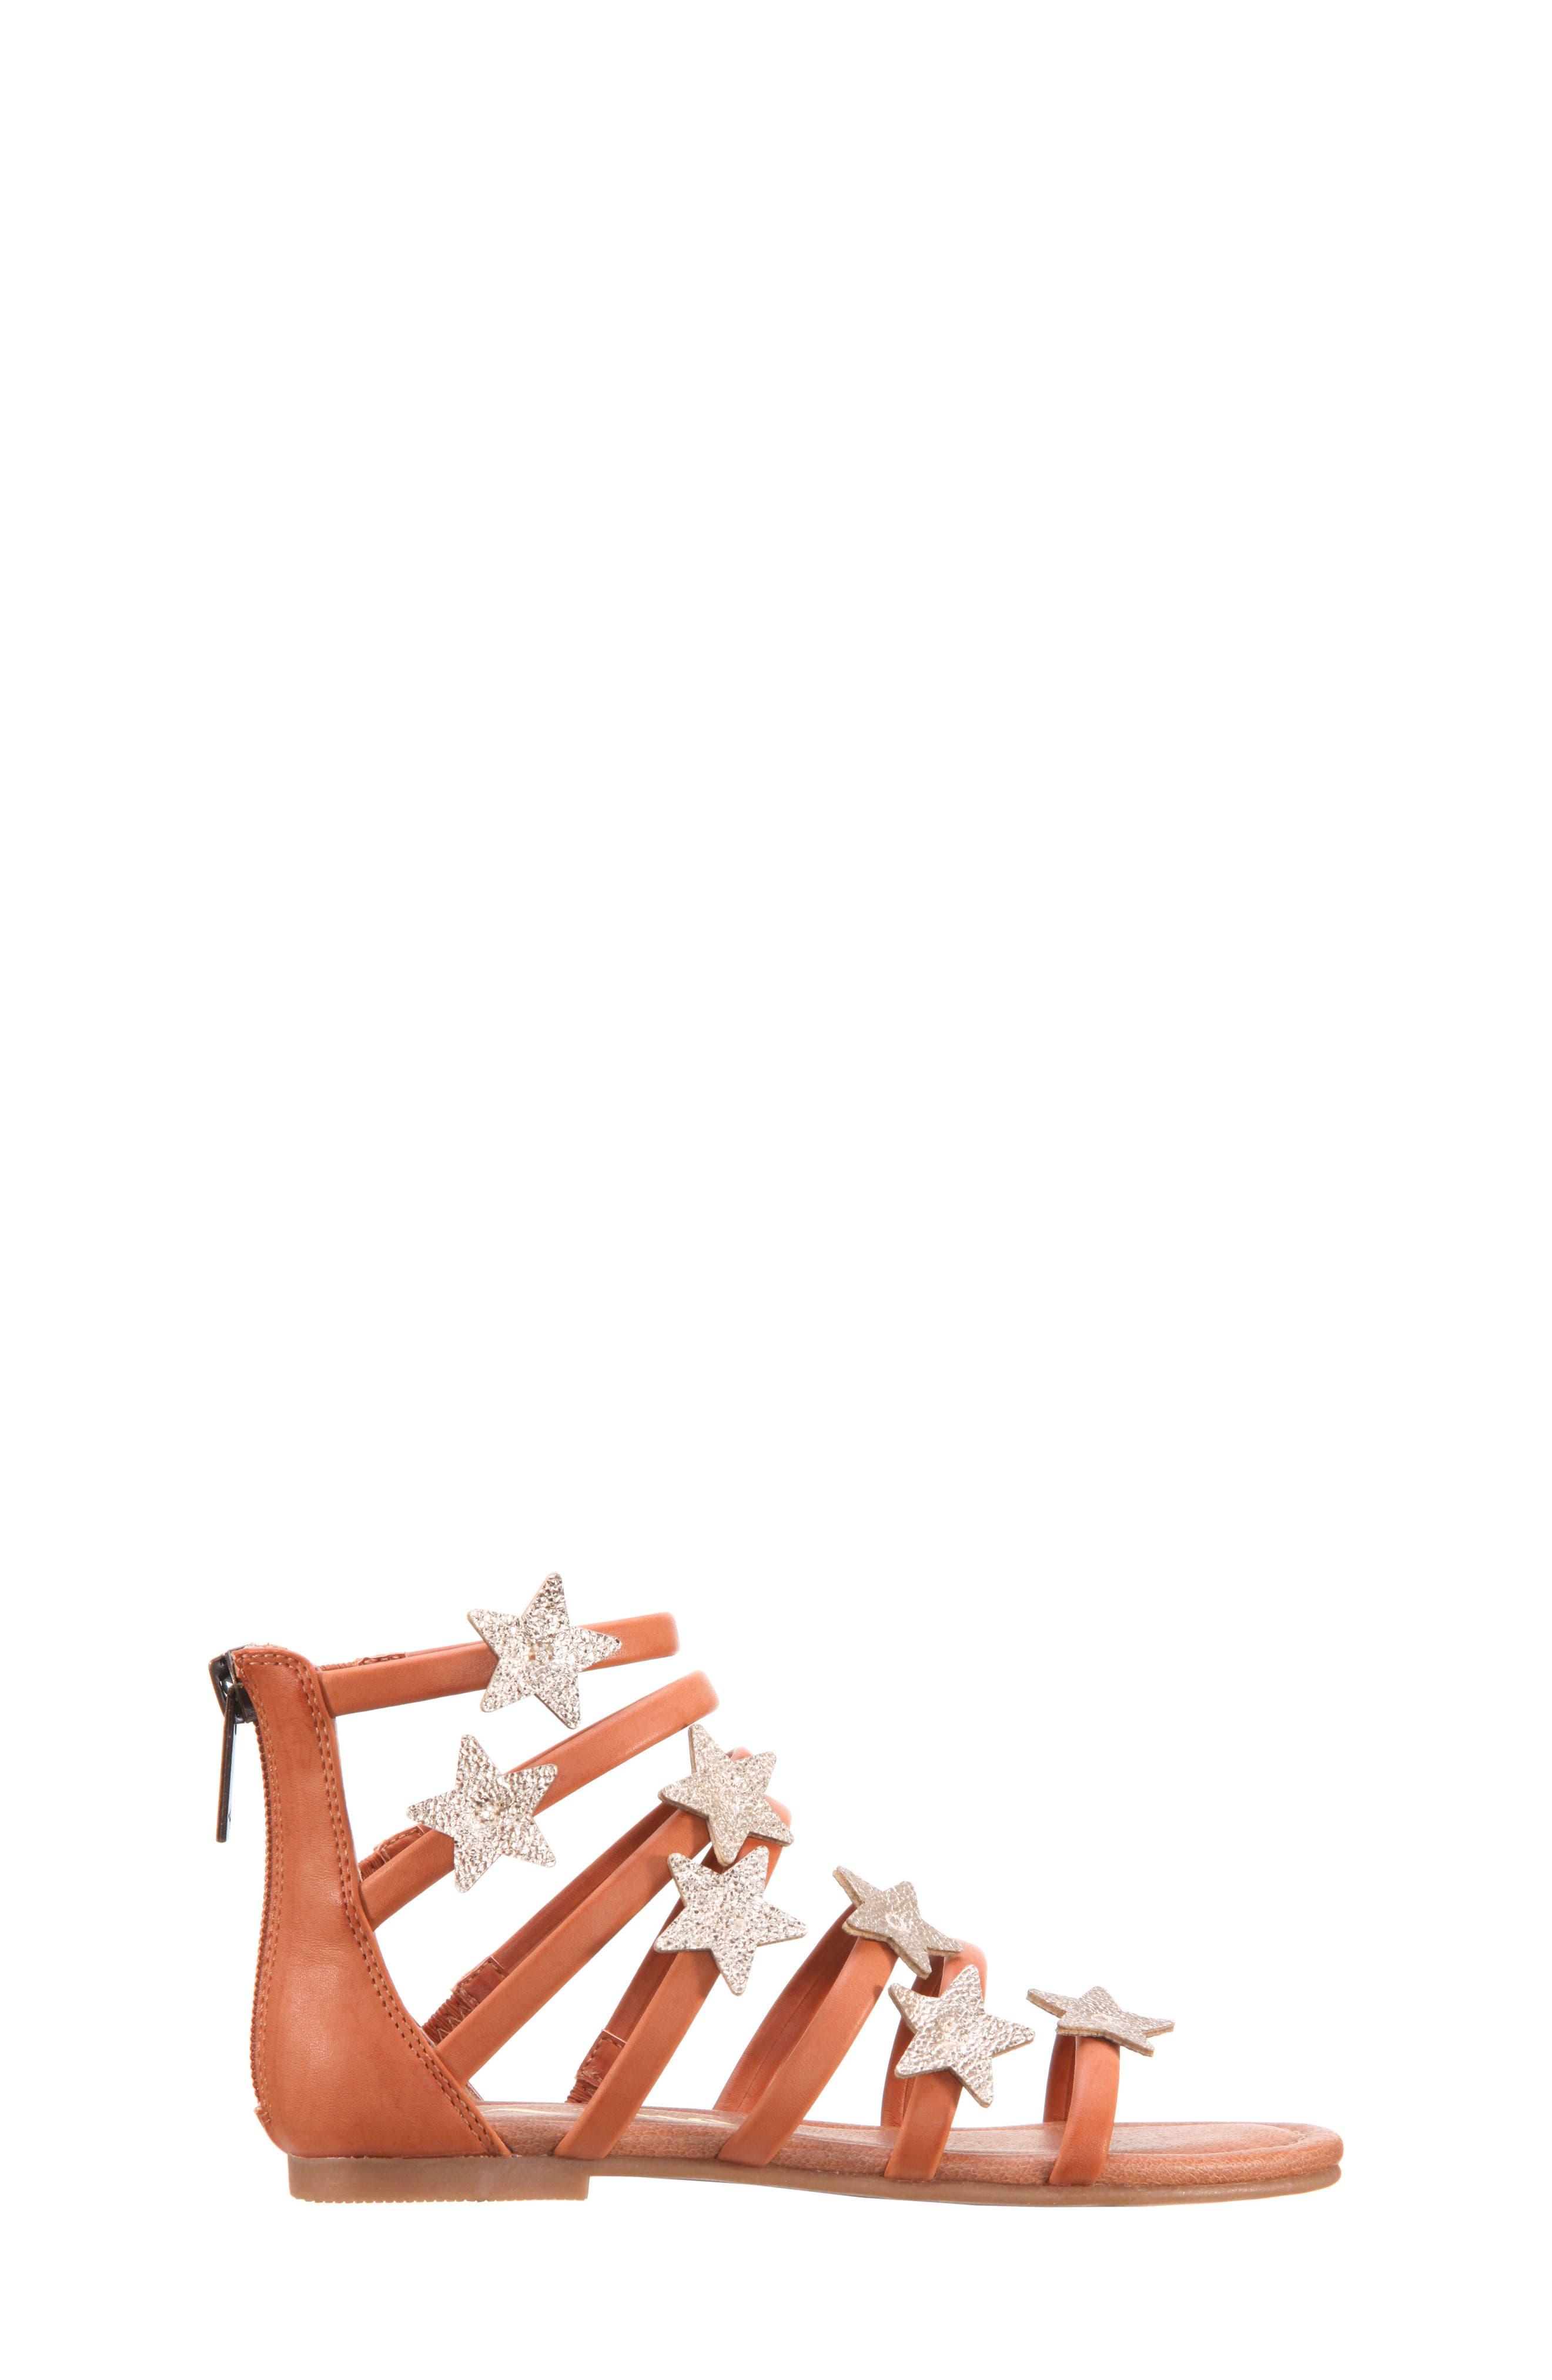 Robertha Gladiator Sandal,                             Alternate thumbnail 3, color,                             Tan Smooth/ Gold Metallic